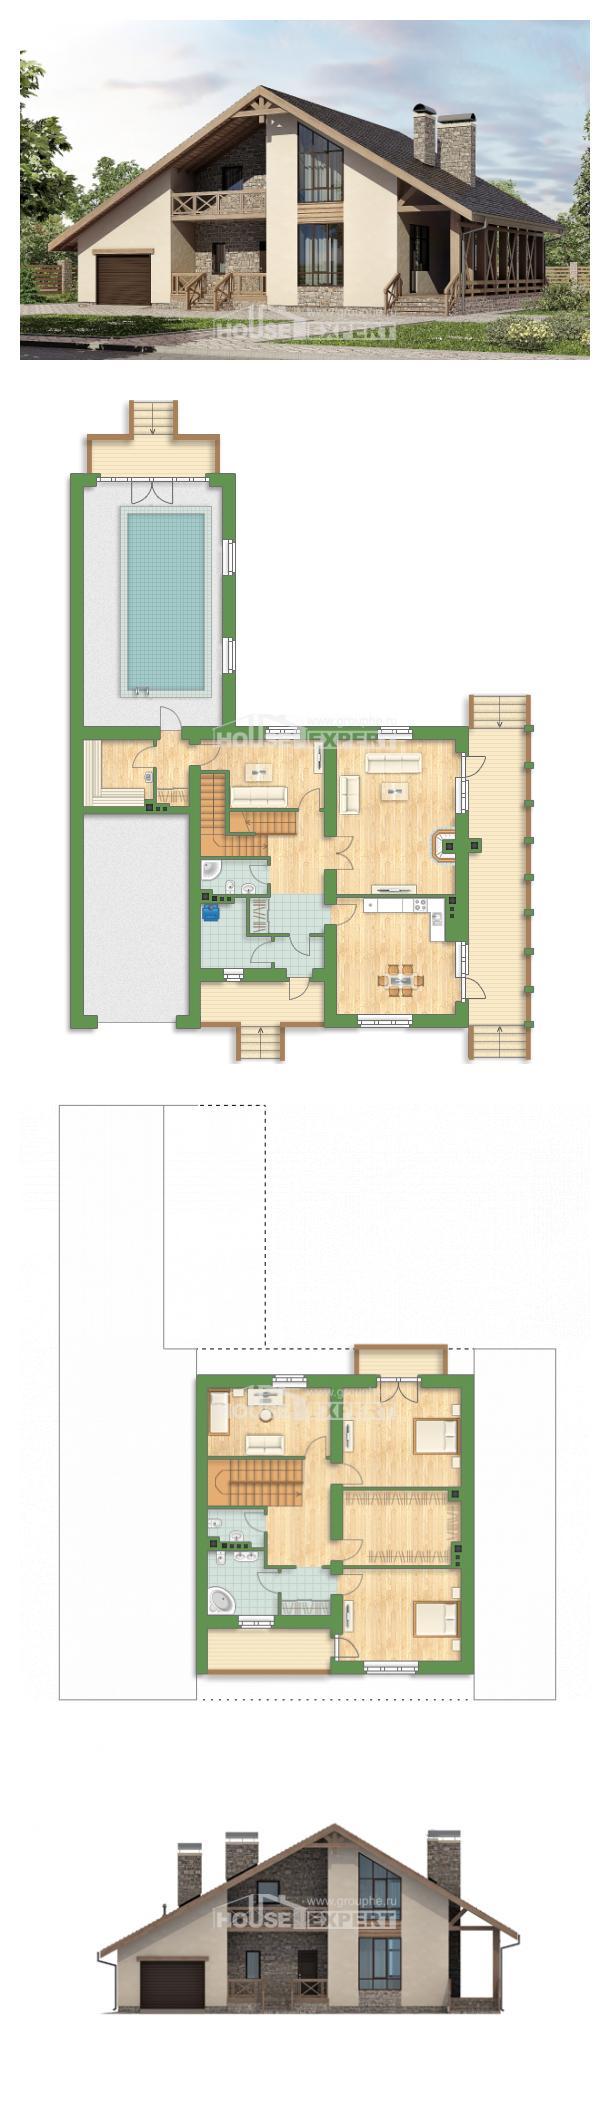 Проект дома 265-001-Л | House Expert